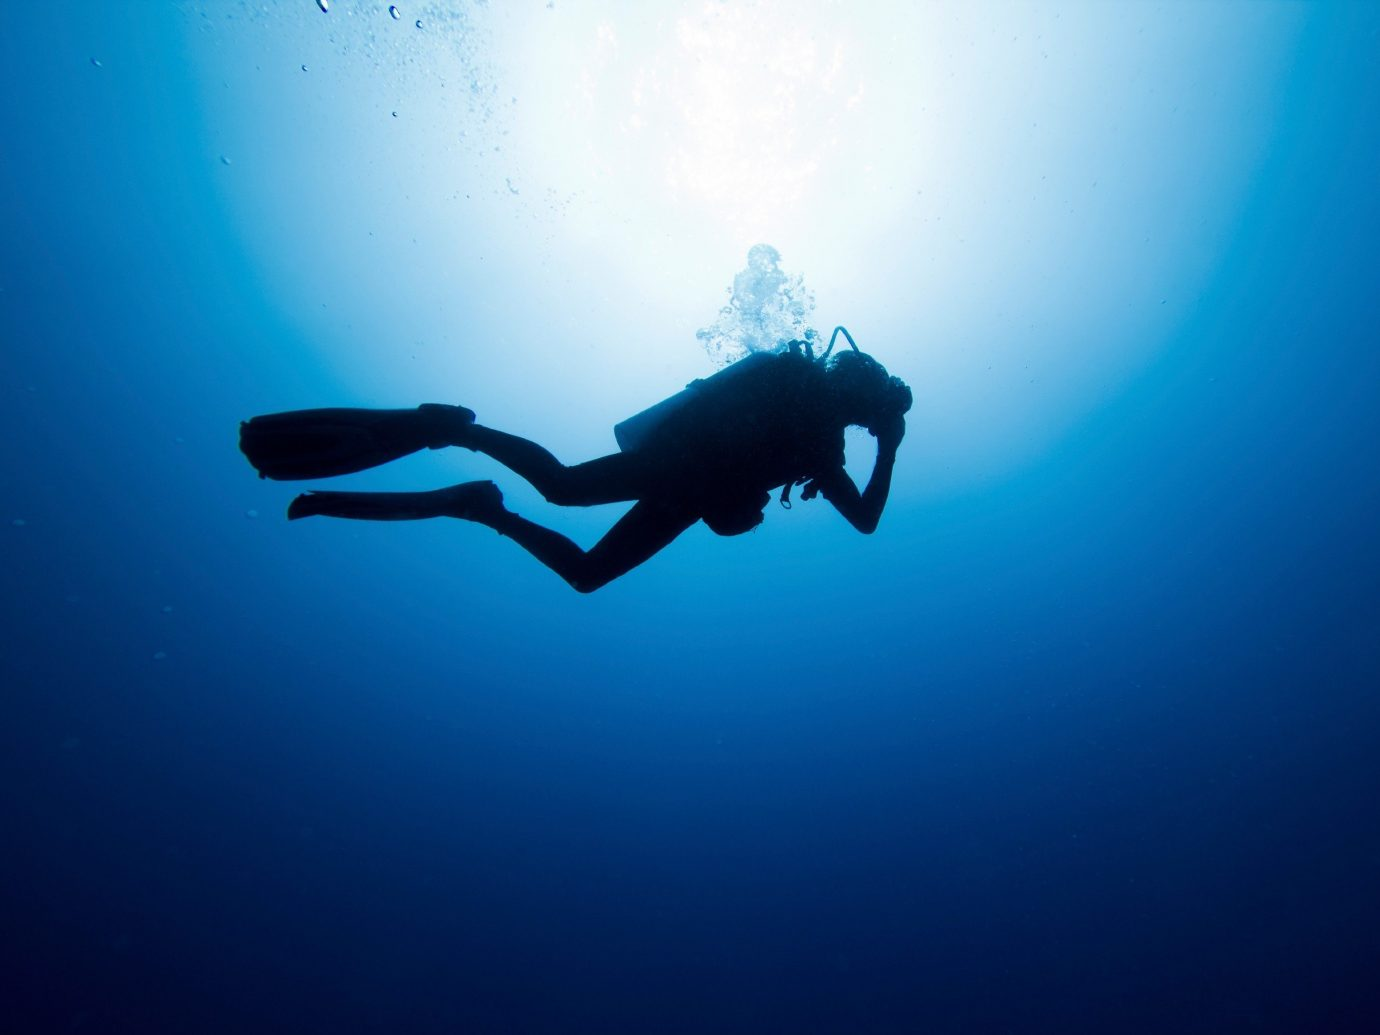 Arts + Culture Offbeat Scuba Diving + Snorkeling Trip Ideas water sport underwater diving blue swimming underwater outdoor Sport freediving diving sports outdoor recreation recreation extreme sport Scuba Diving computer wallpaper ocean floor